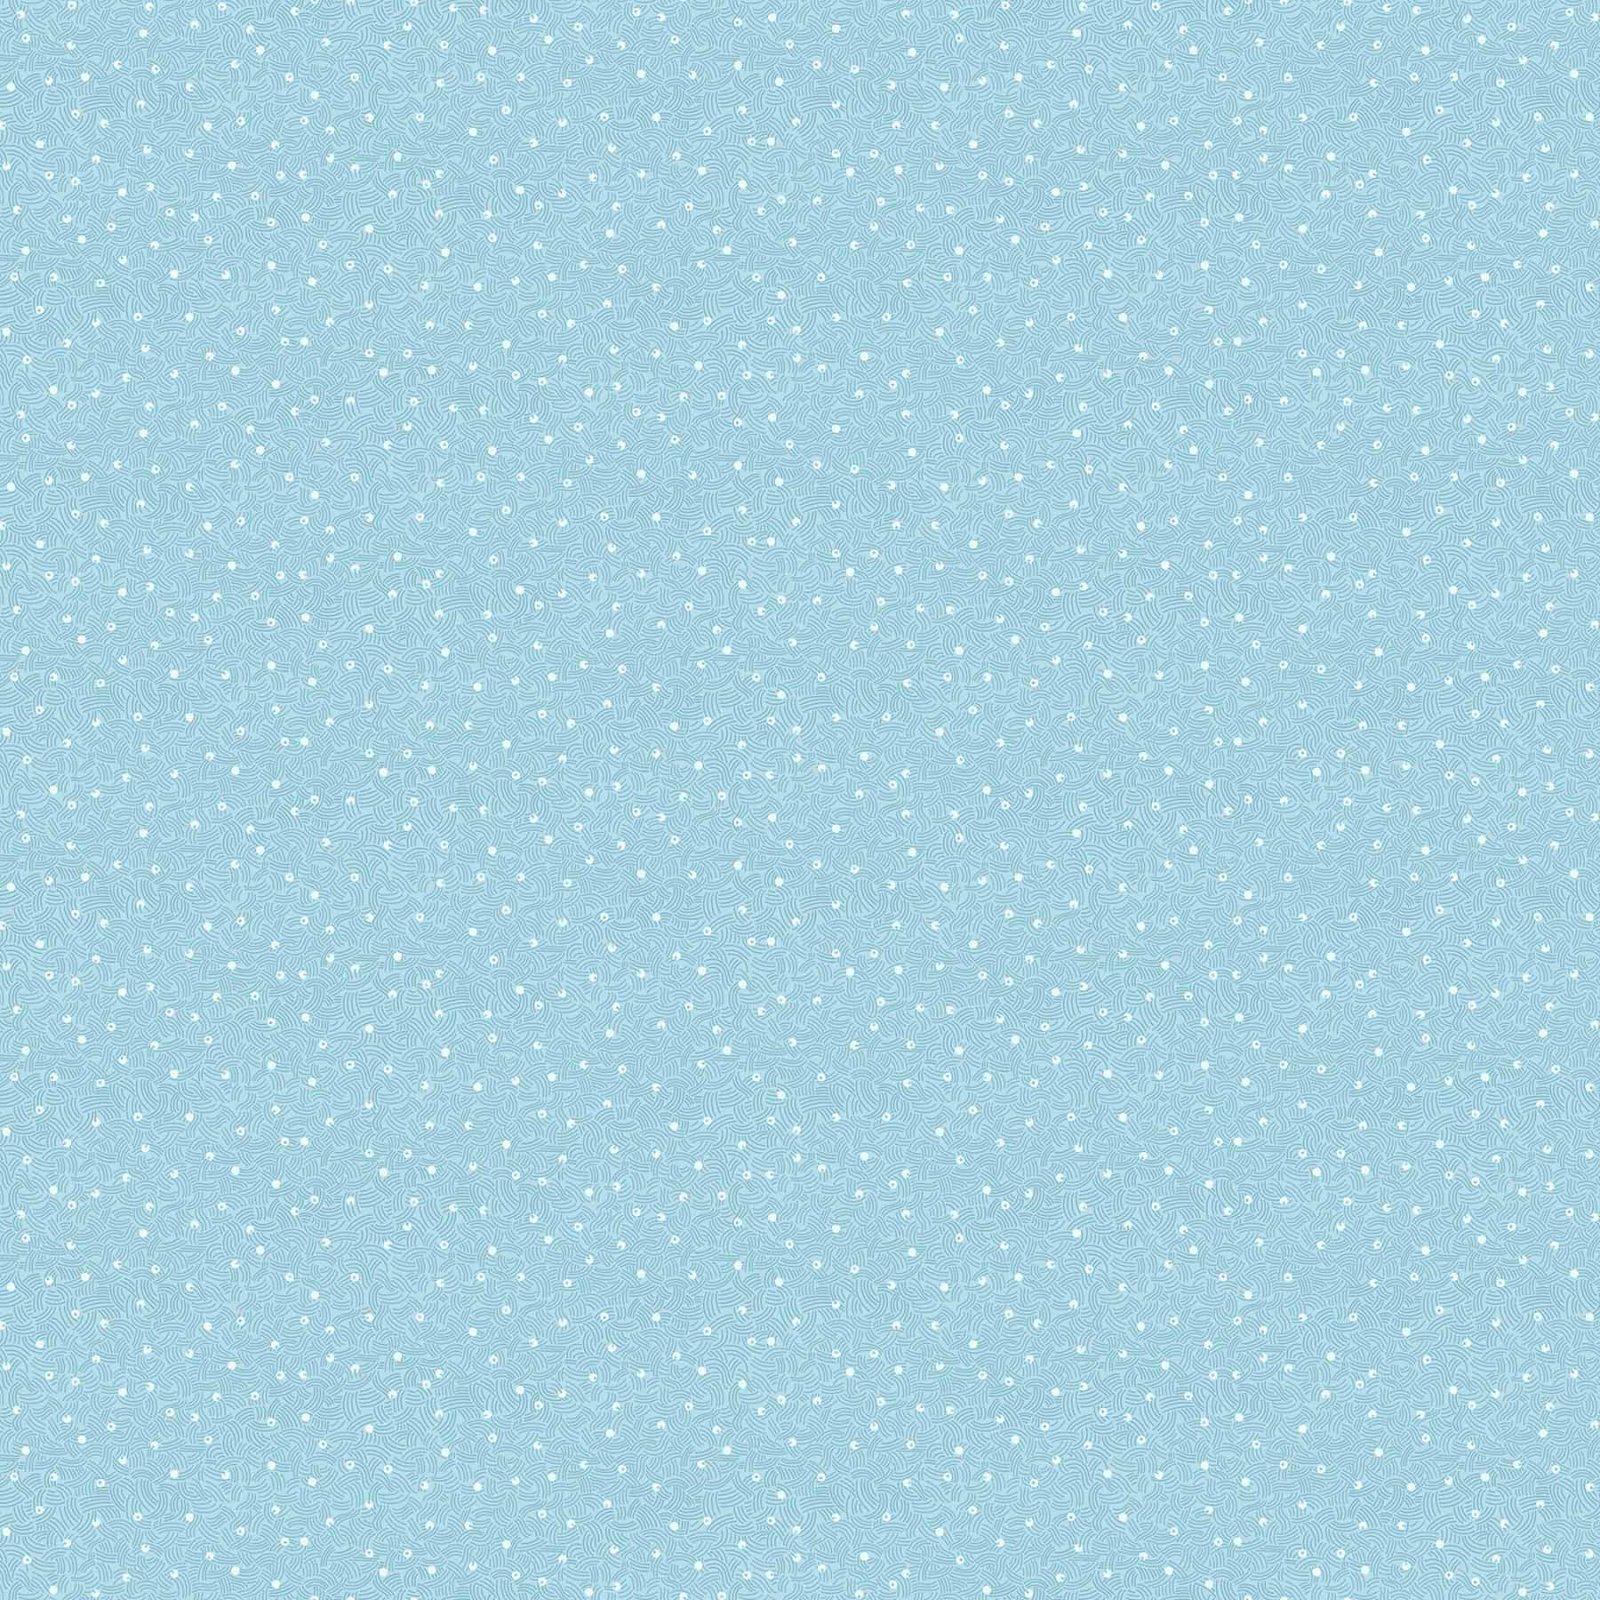 Figo Elements - Scratch Blue